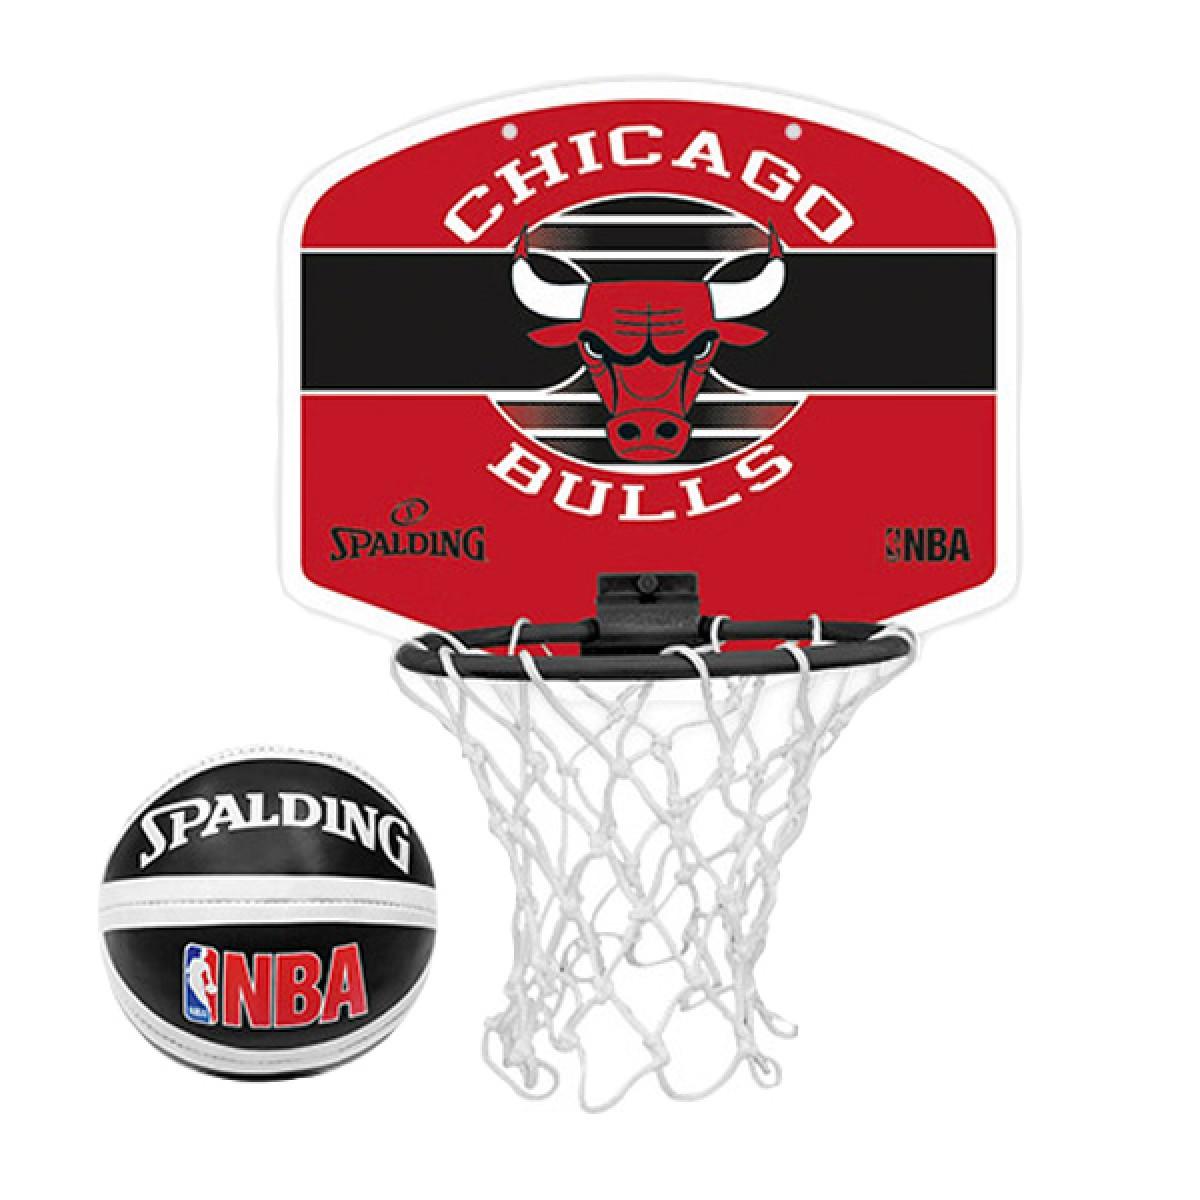 Spalding NBA Miniboard 'Bulls'